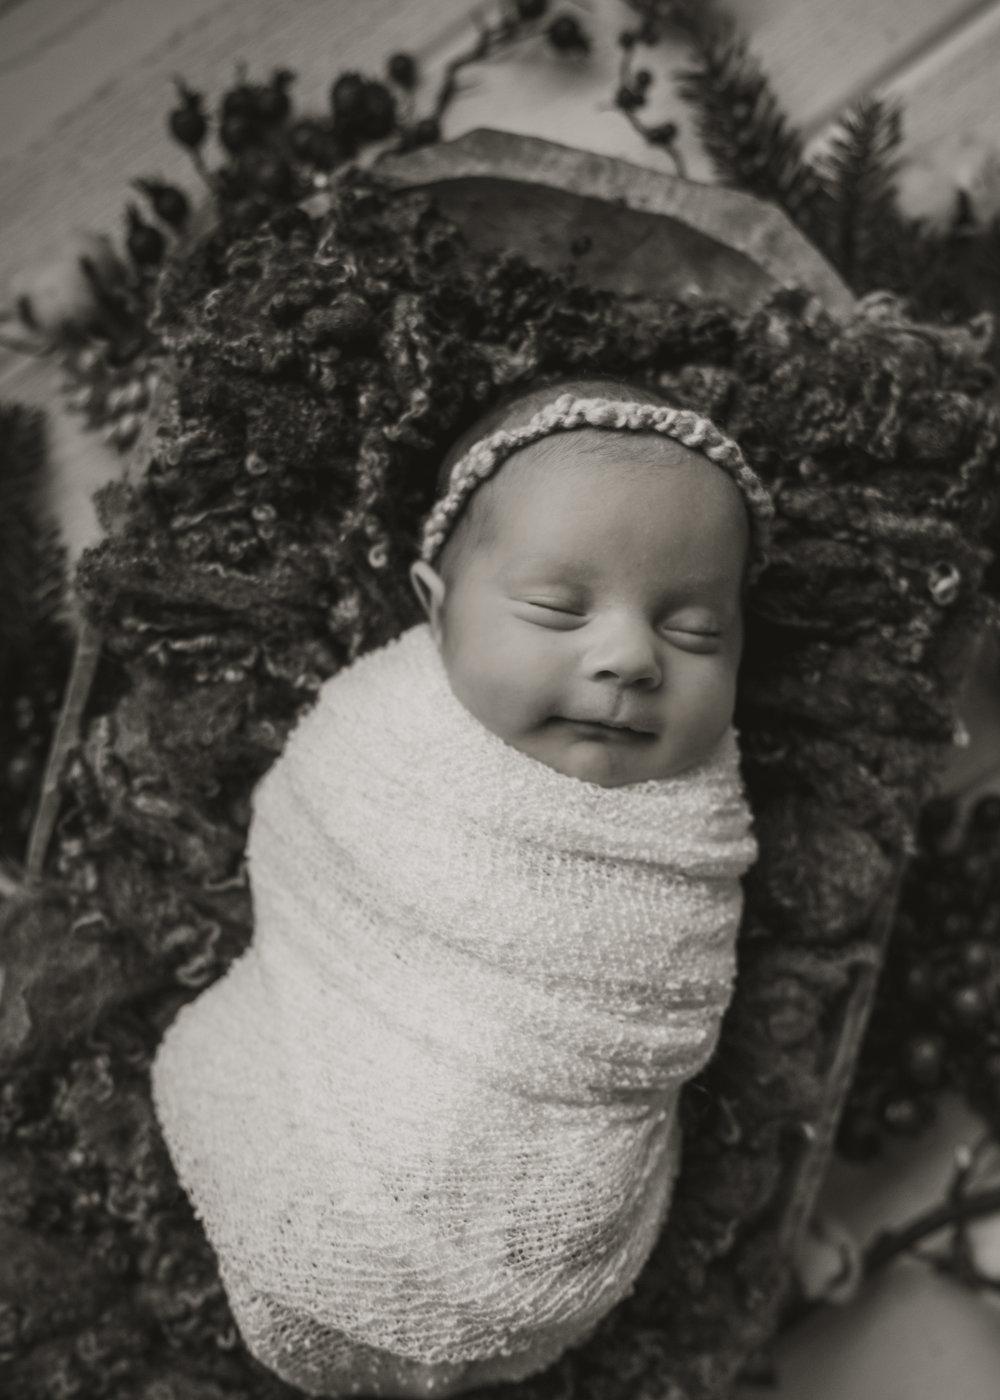 Laura Olson Photography - Nievelina - Newborns - Nova and Luna - December 2016-1640-2.jpg